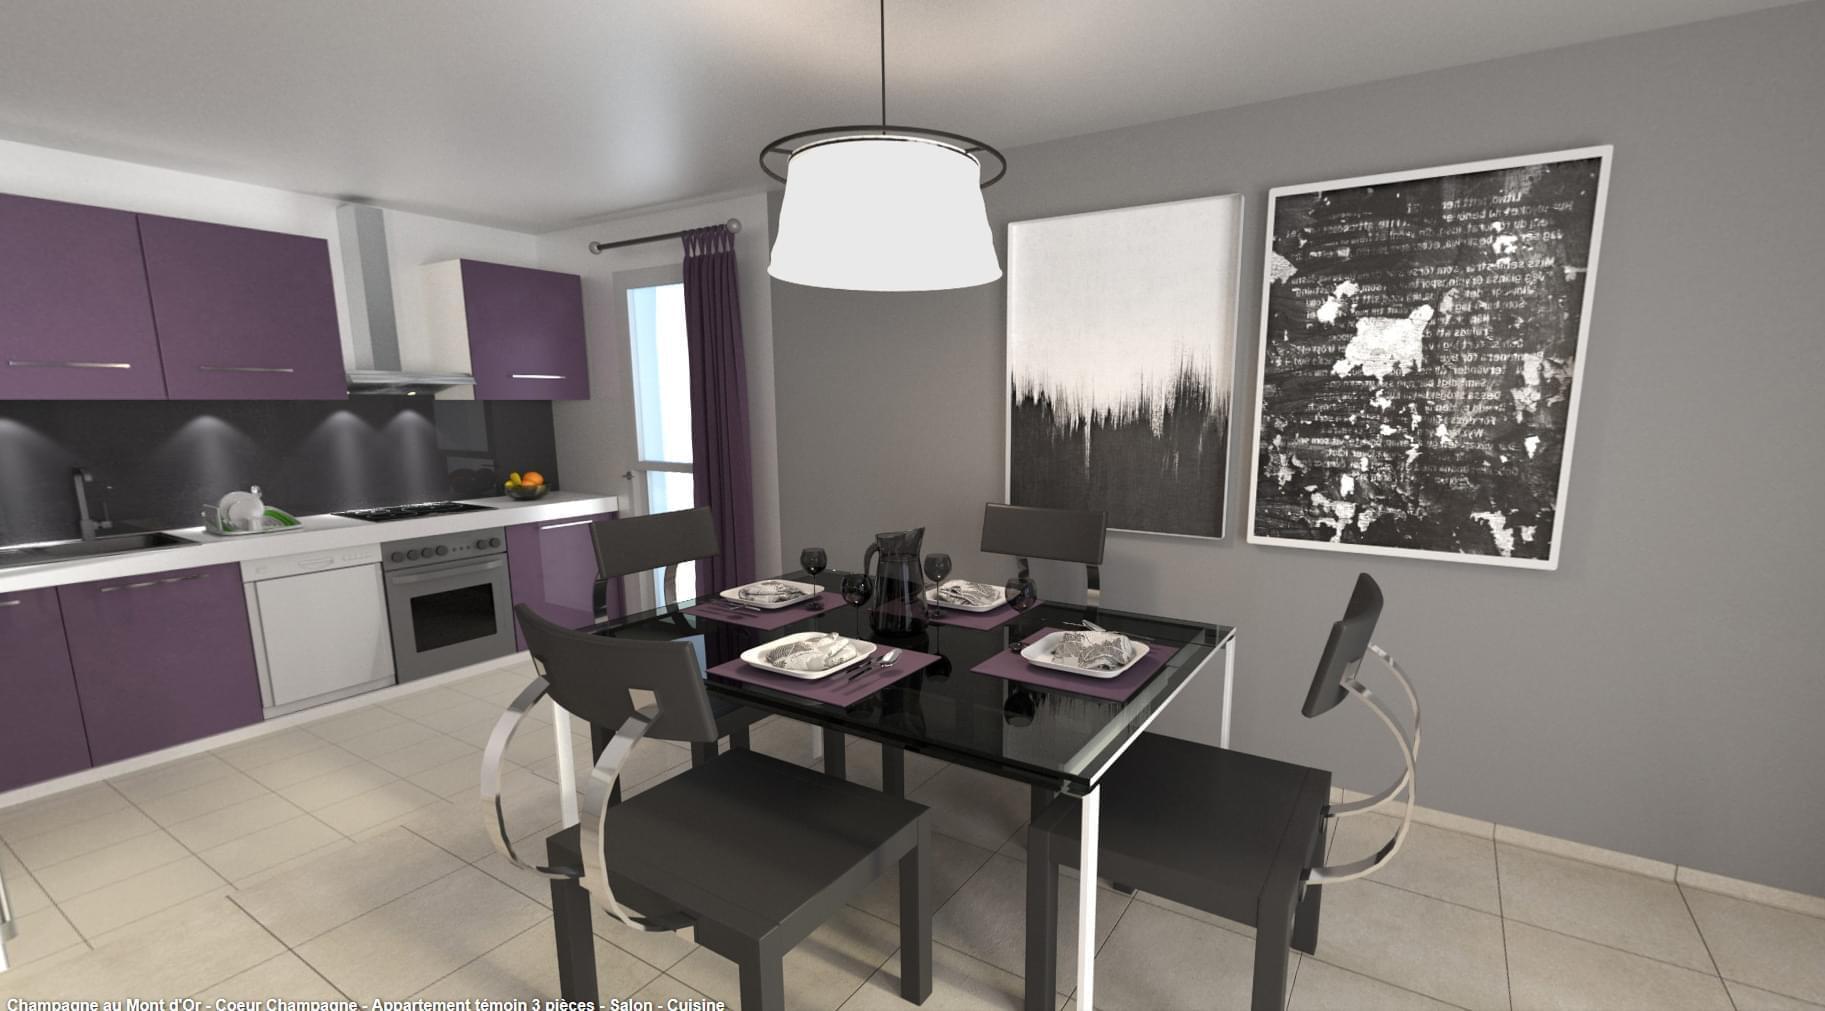 villa champagne au mont d 39 or coeur champagne maisons. Black Bedroom Furniture Sets. Home Design Ideas